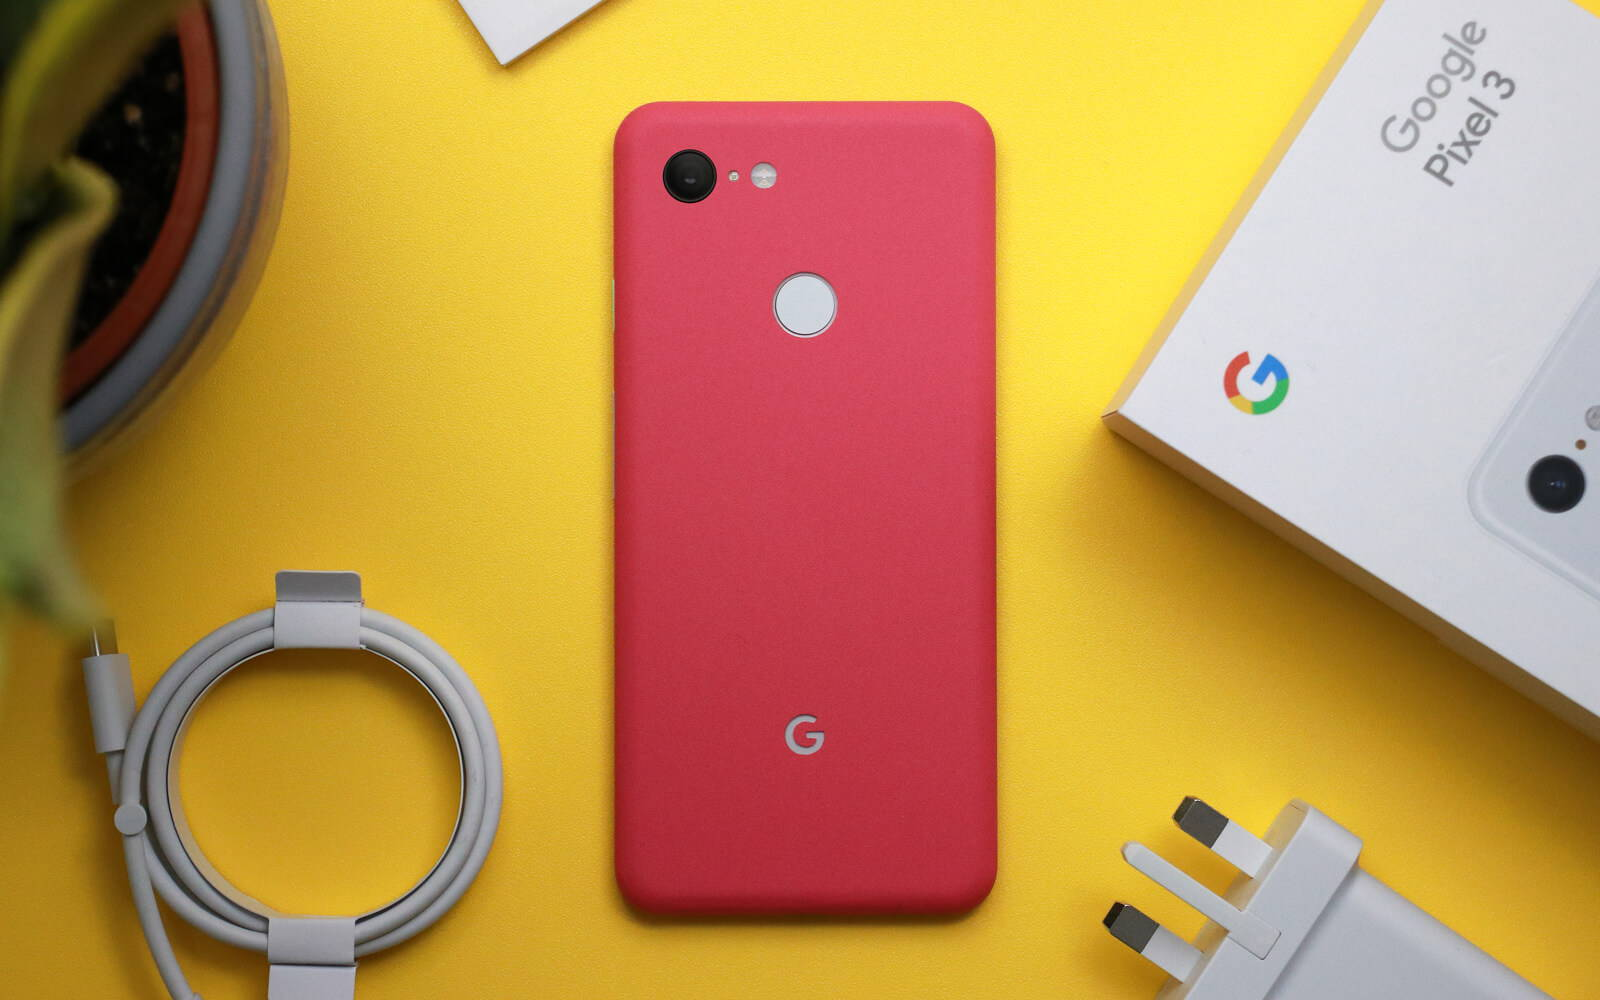 Google Piel 3 XL True Colour Pink Skins